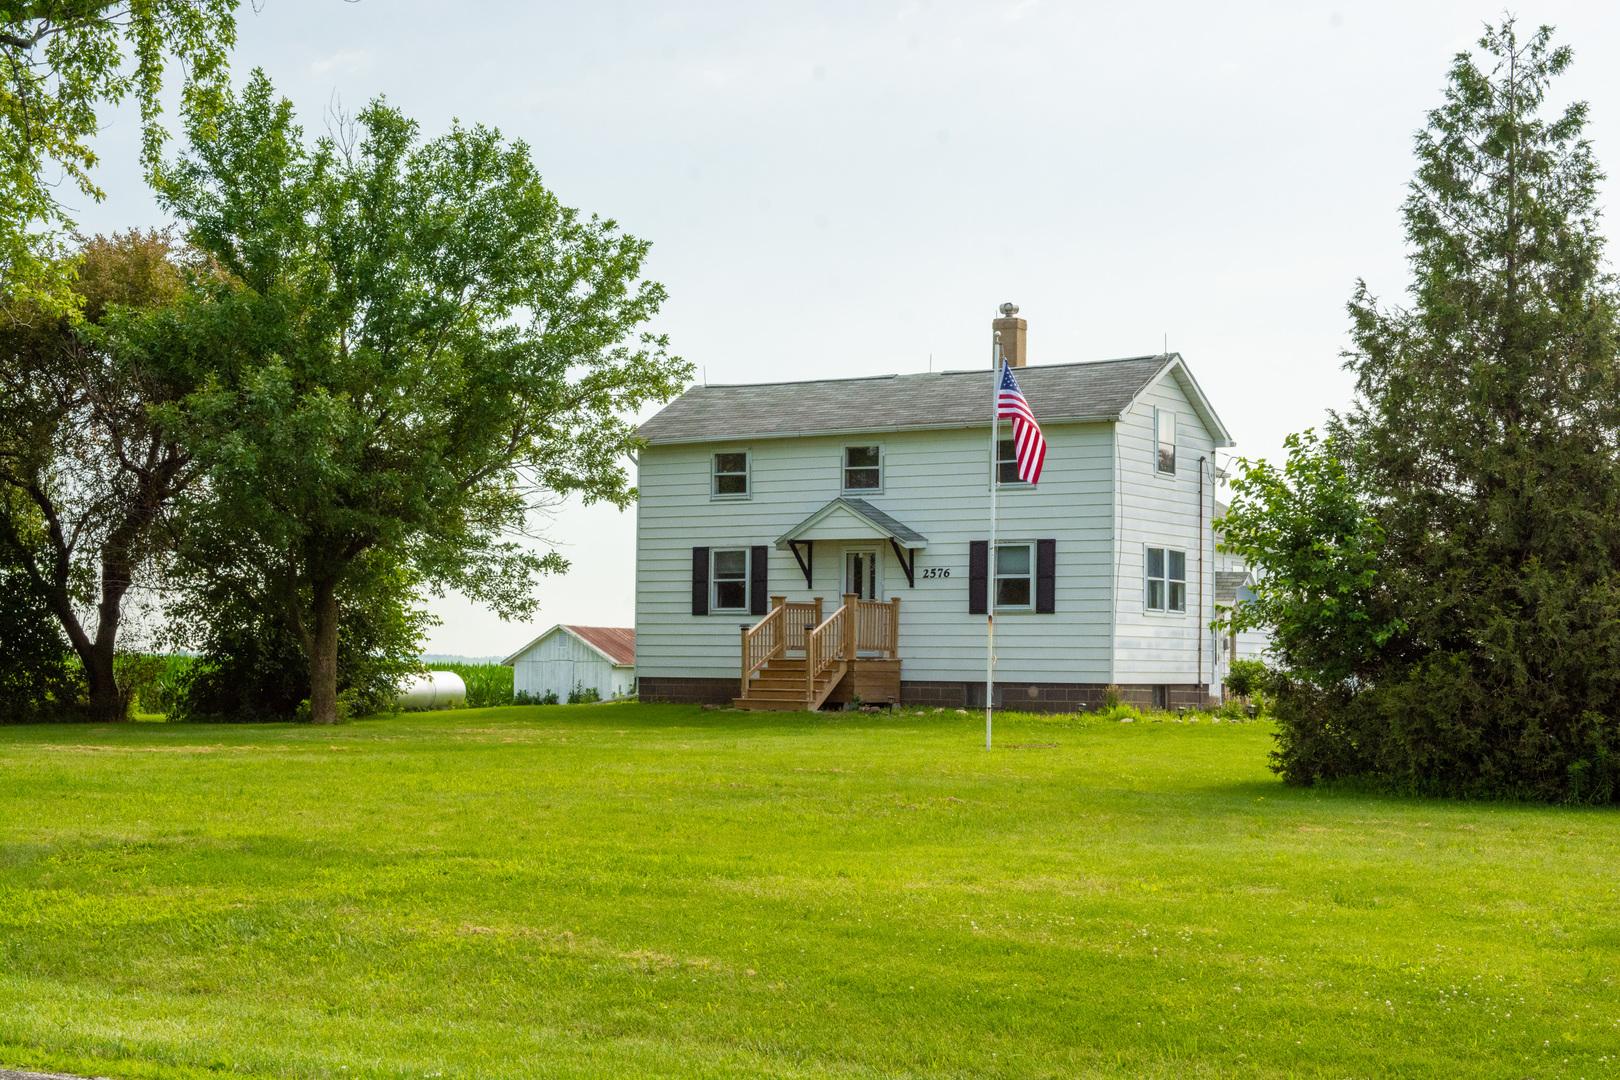 2576 County Road 1900 East, Thomasboro, Illinois, 61878